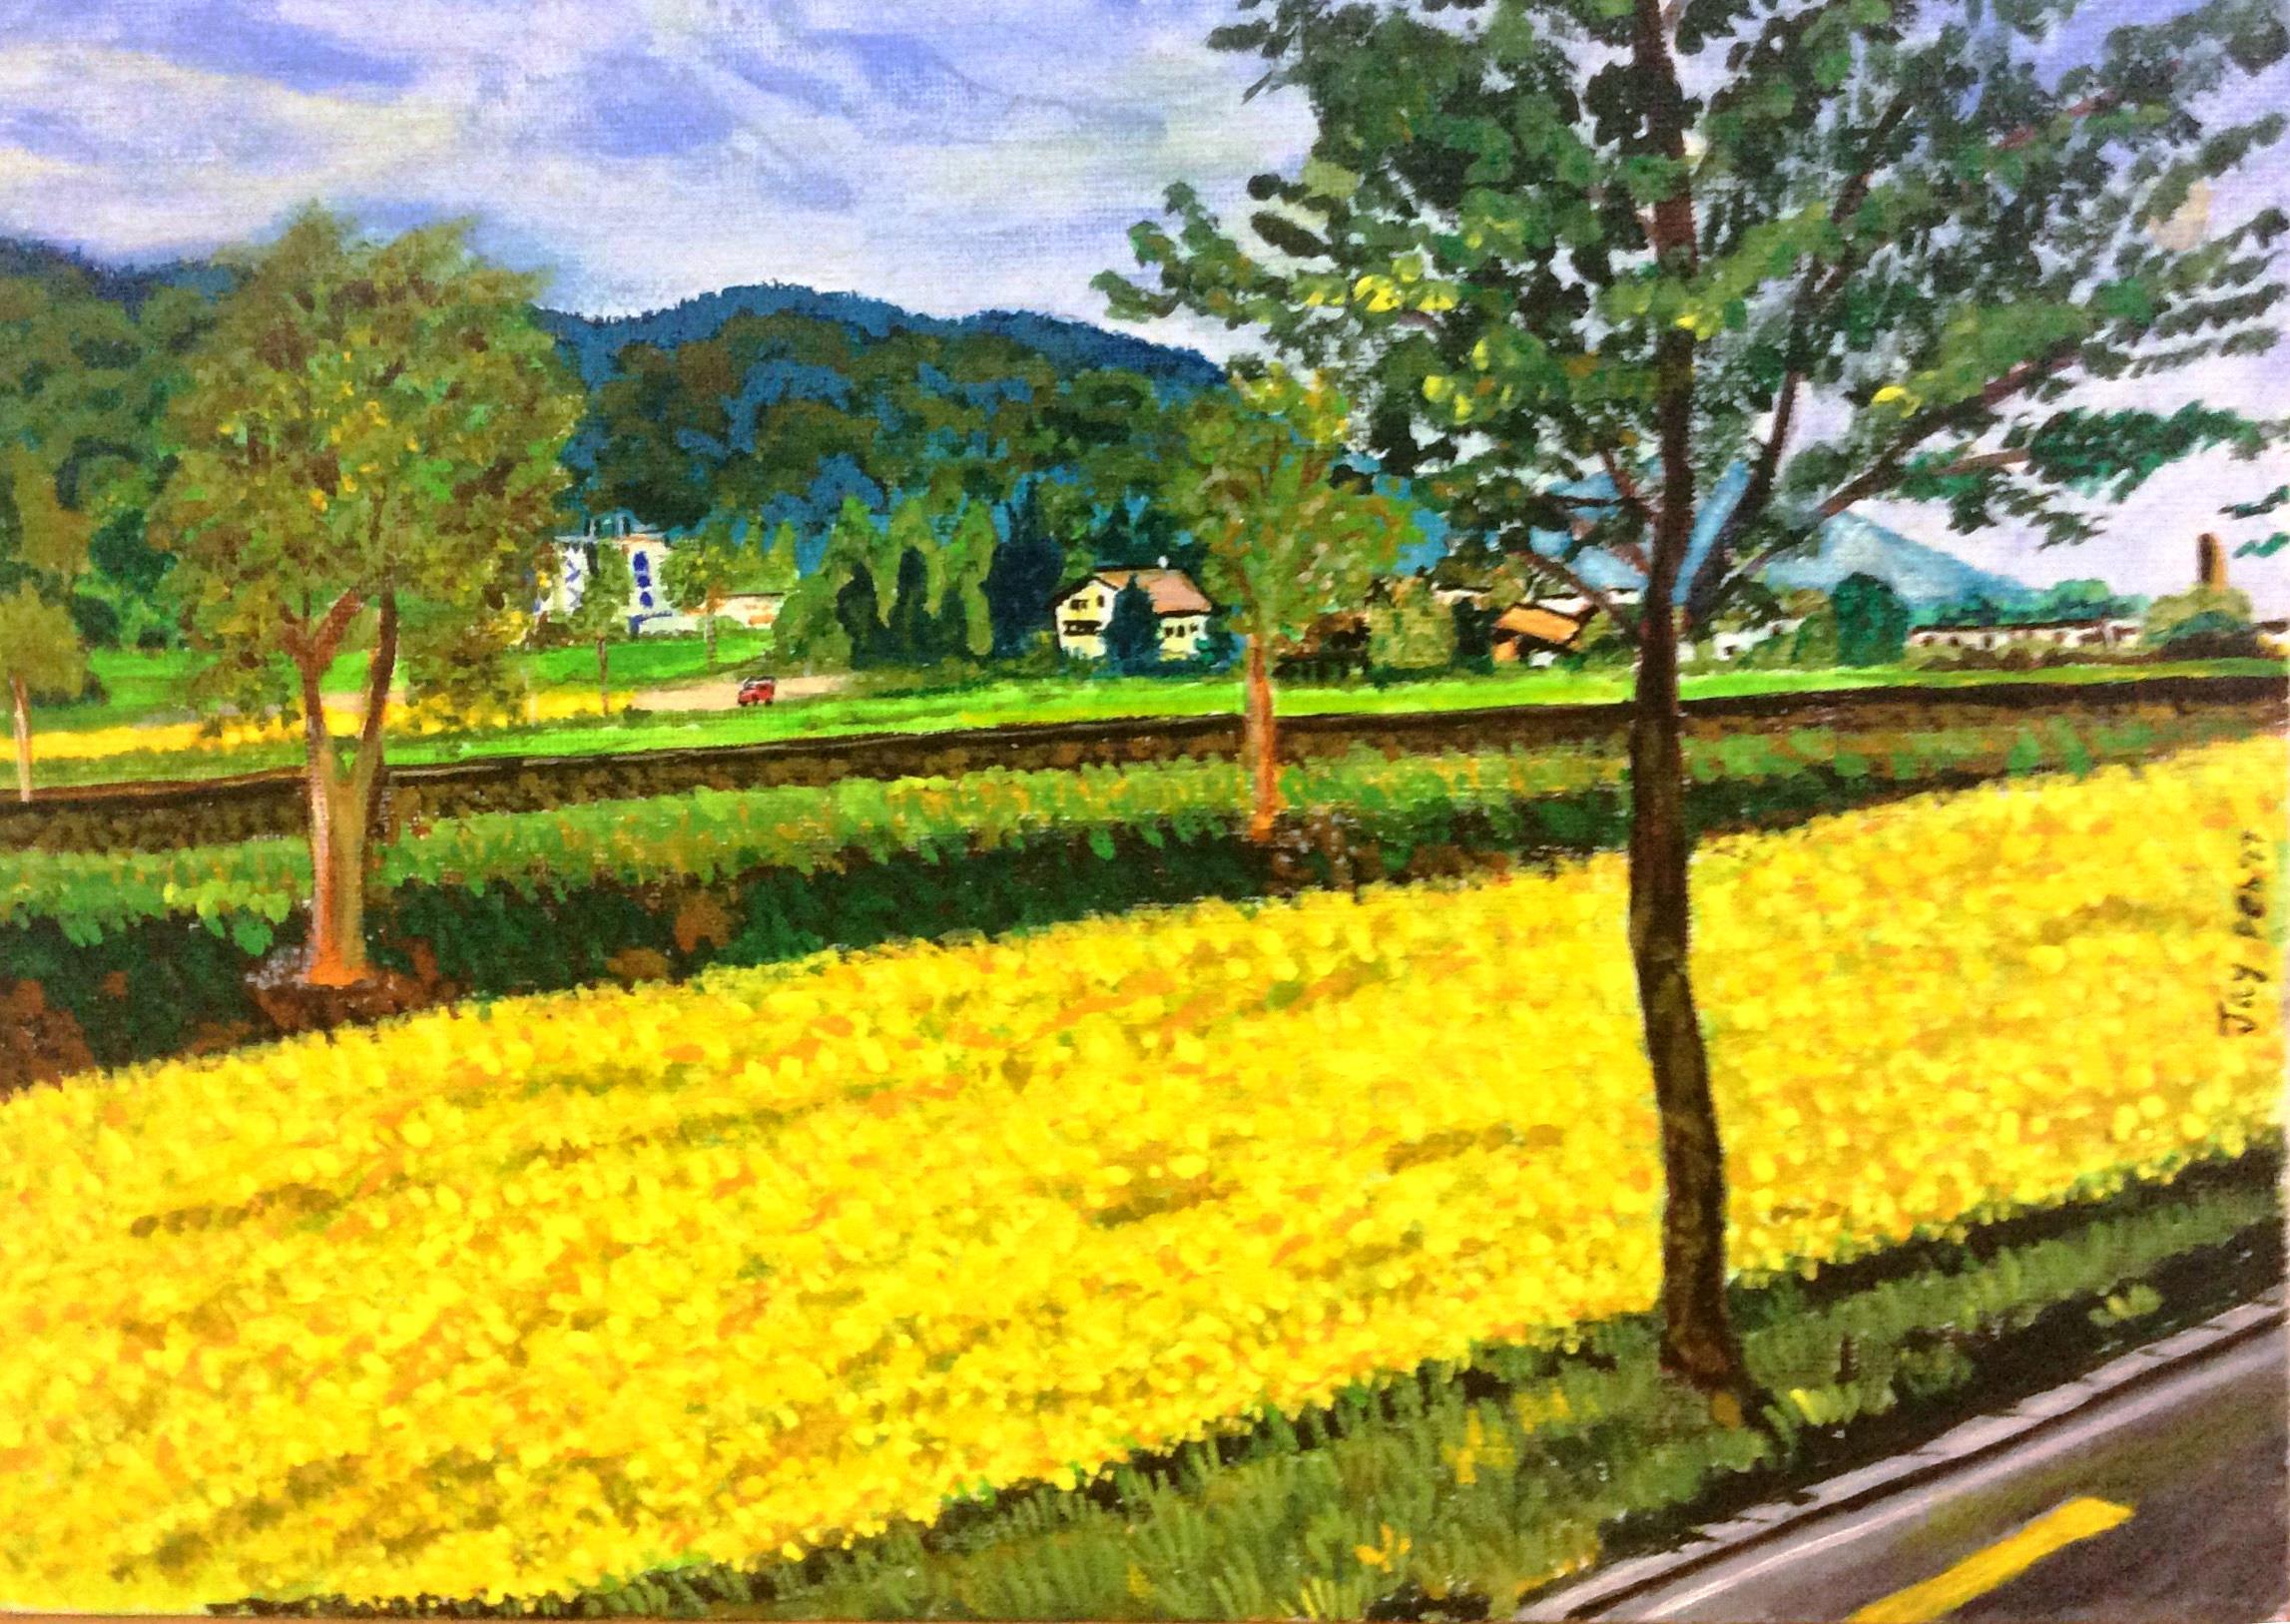 Mustard Flower Carpet artwork by Jay Jay - art listed for sale on Artplode